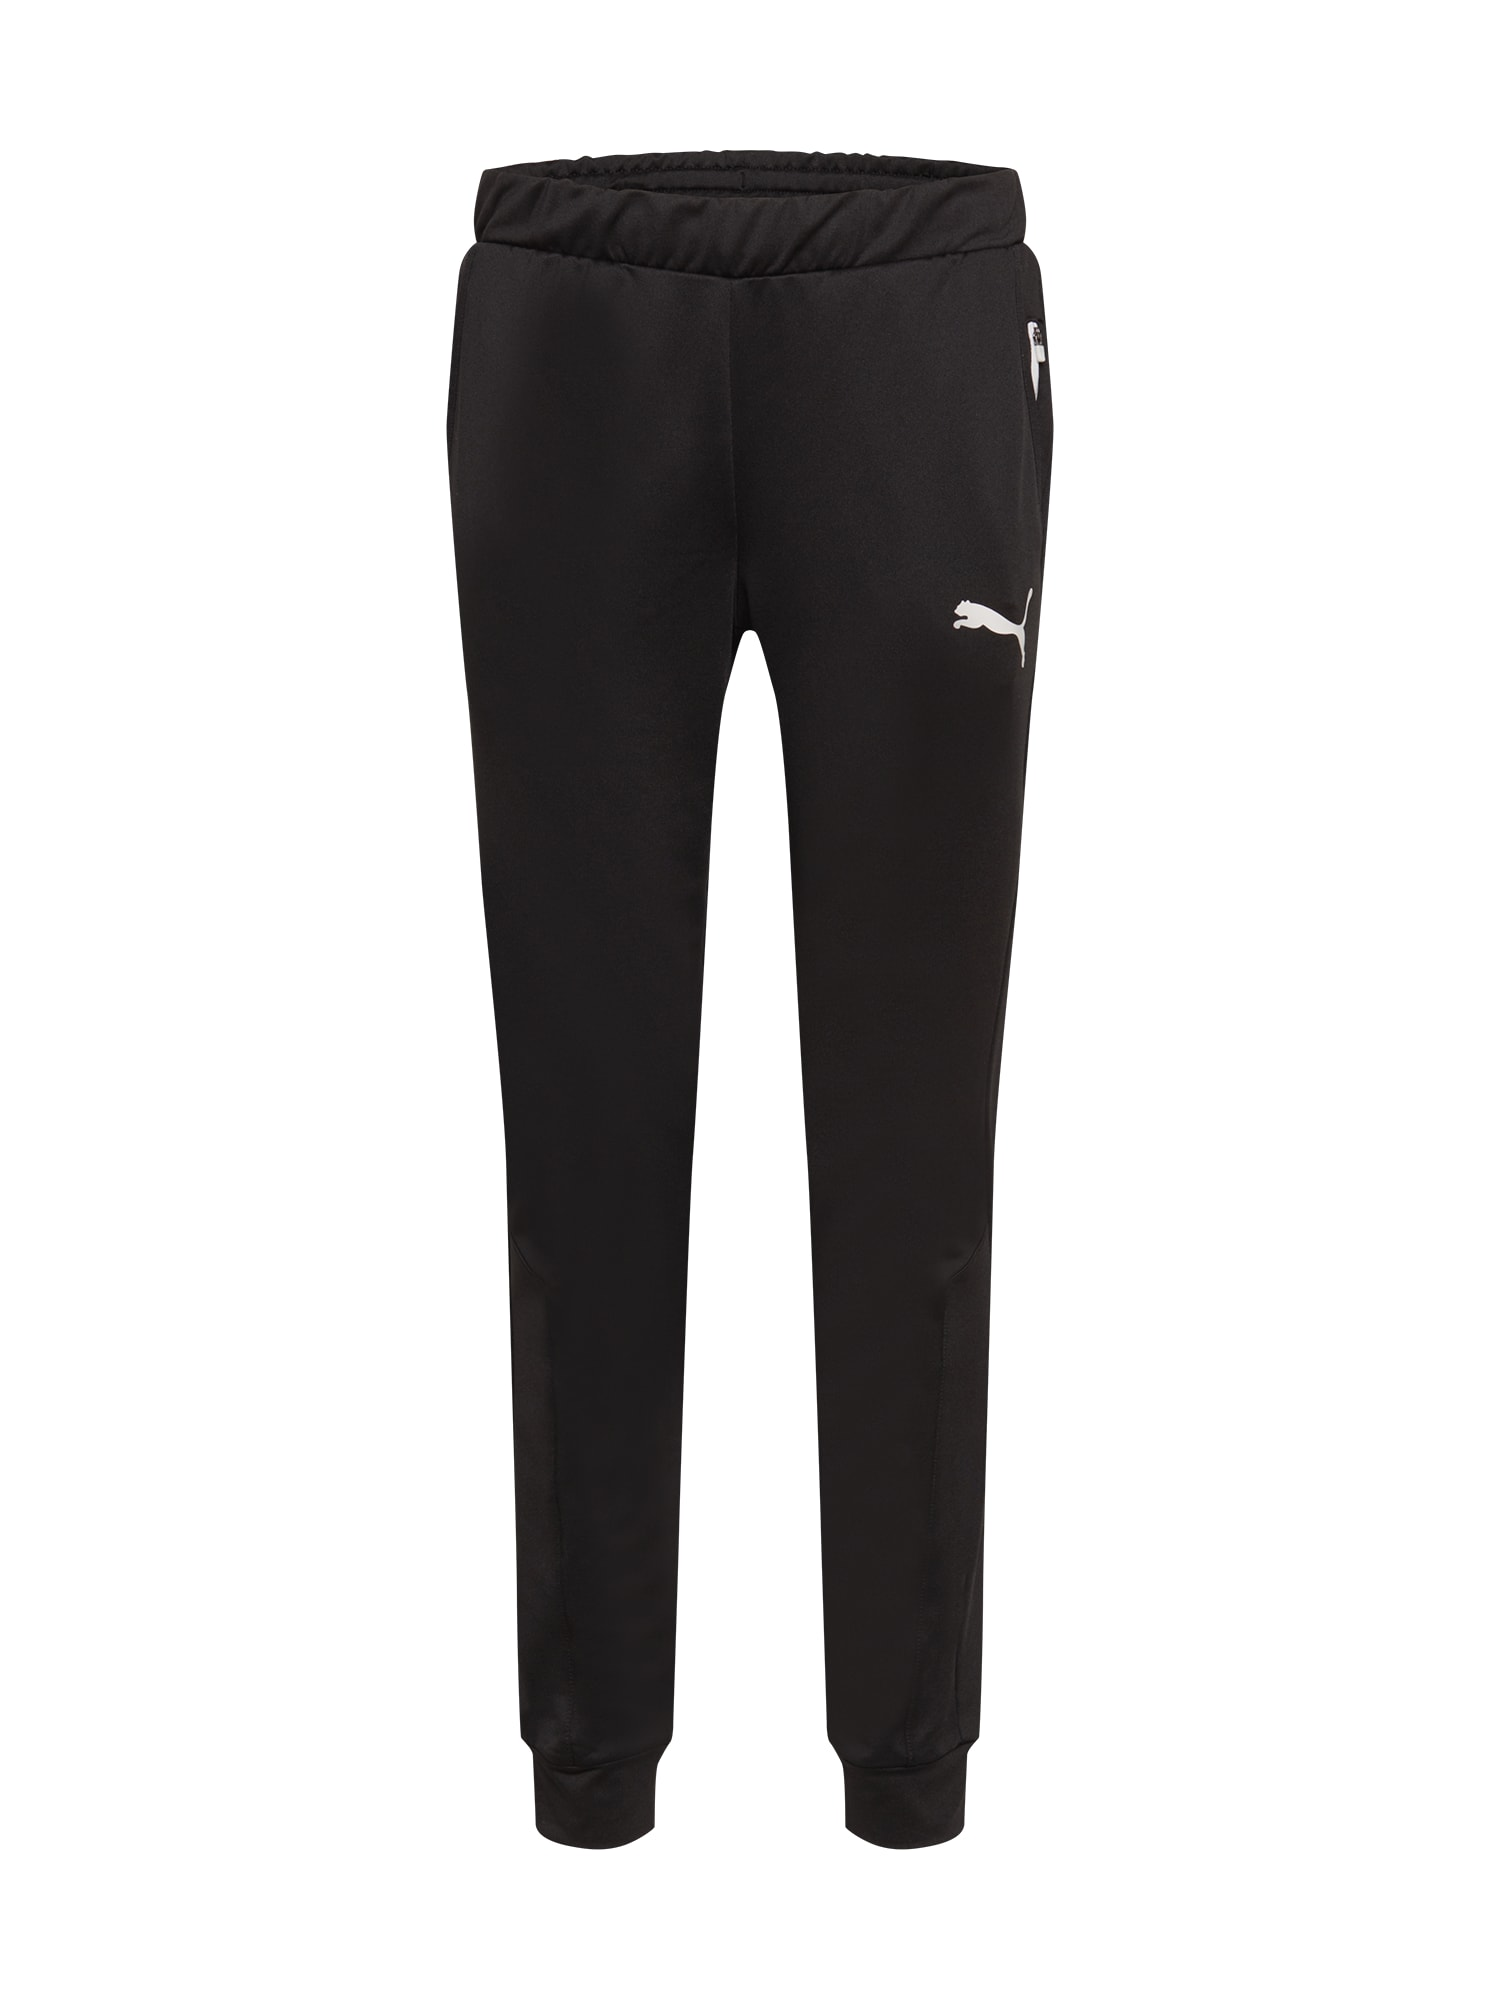 PUMA Pantaloni sportivi  nero / bianco male shop the look